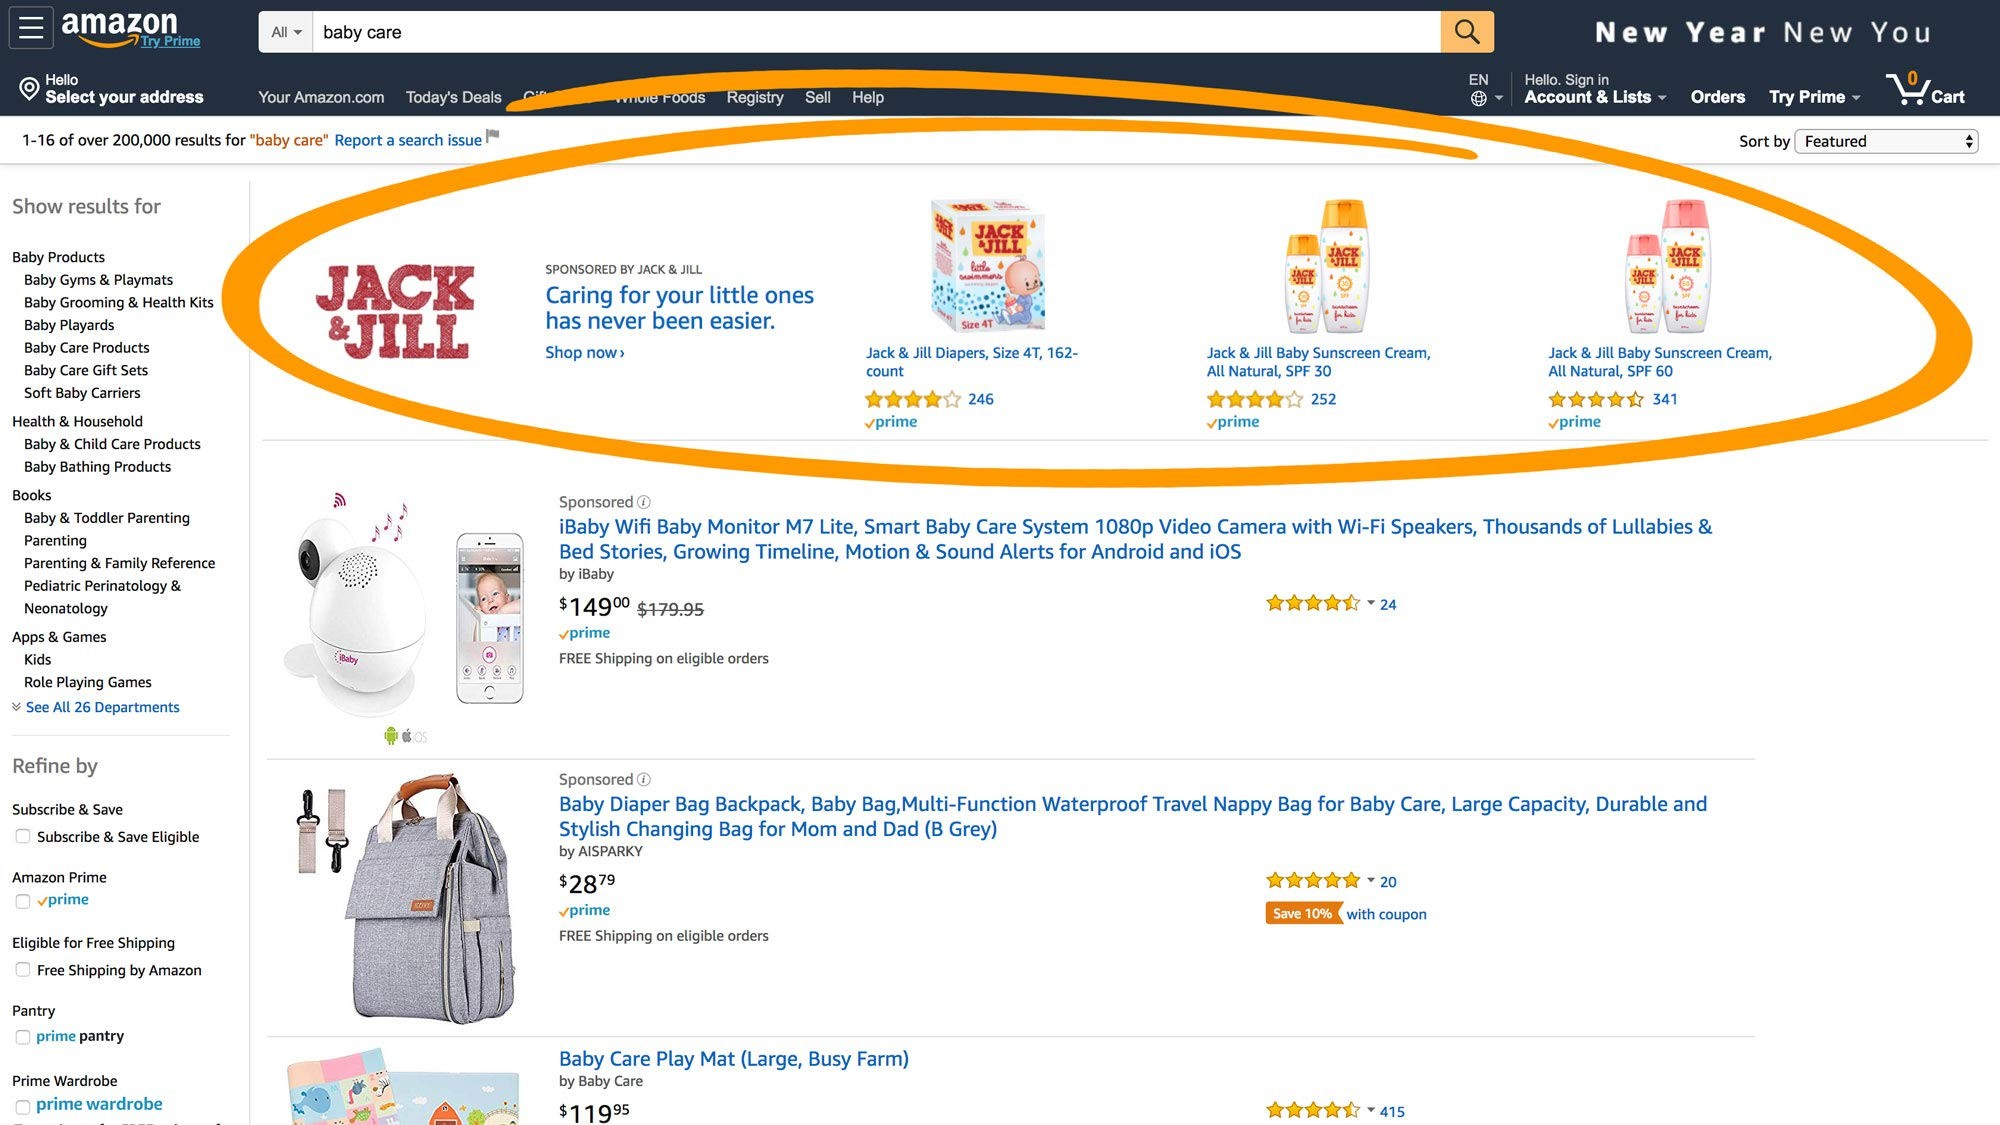 Amazon: sponsored brand